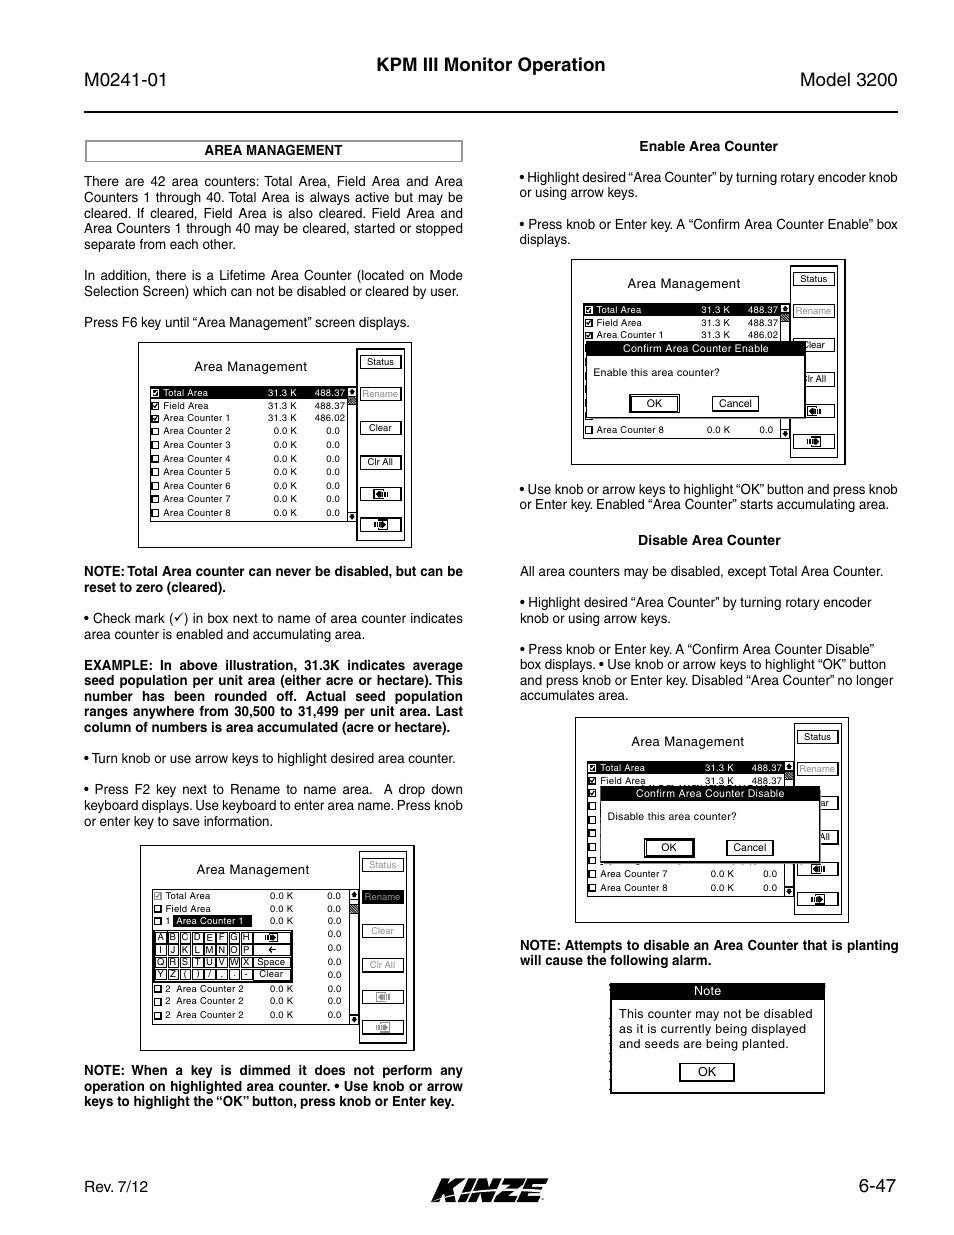 Area management -47, 47 kpm iii monitor operation, Rev. 7/12